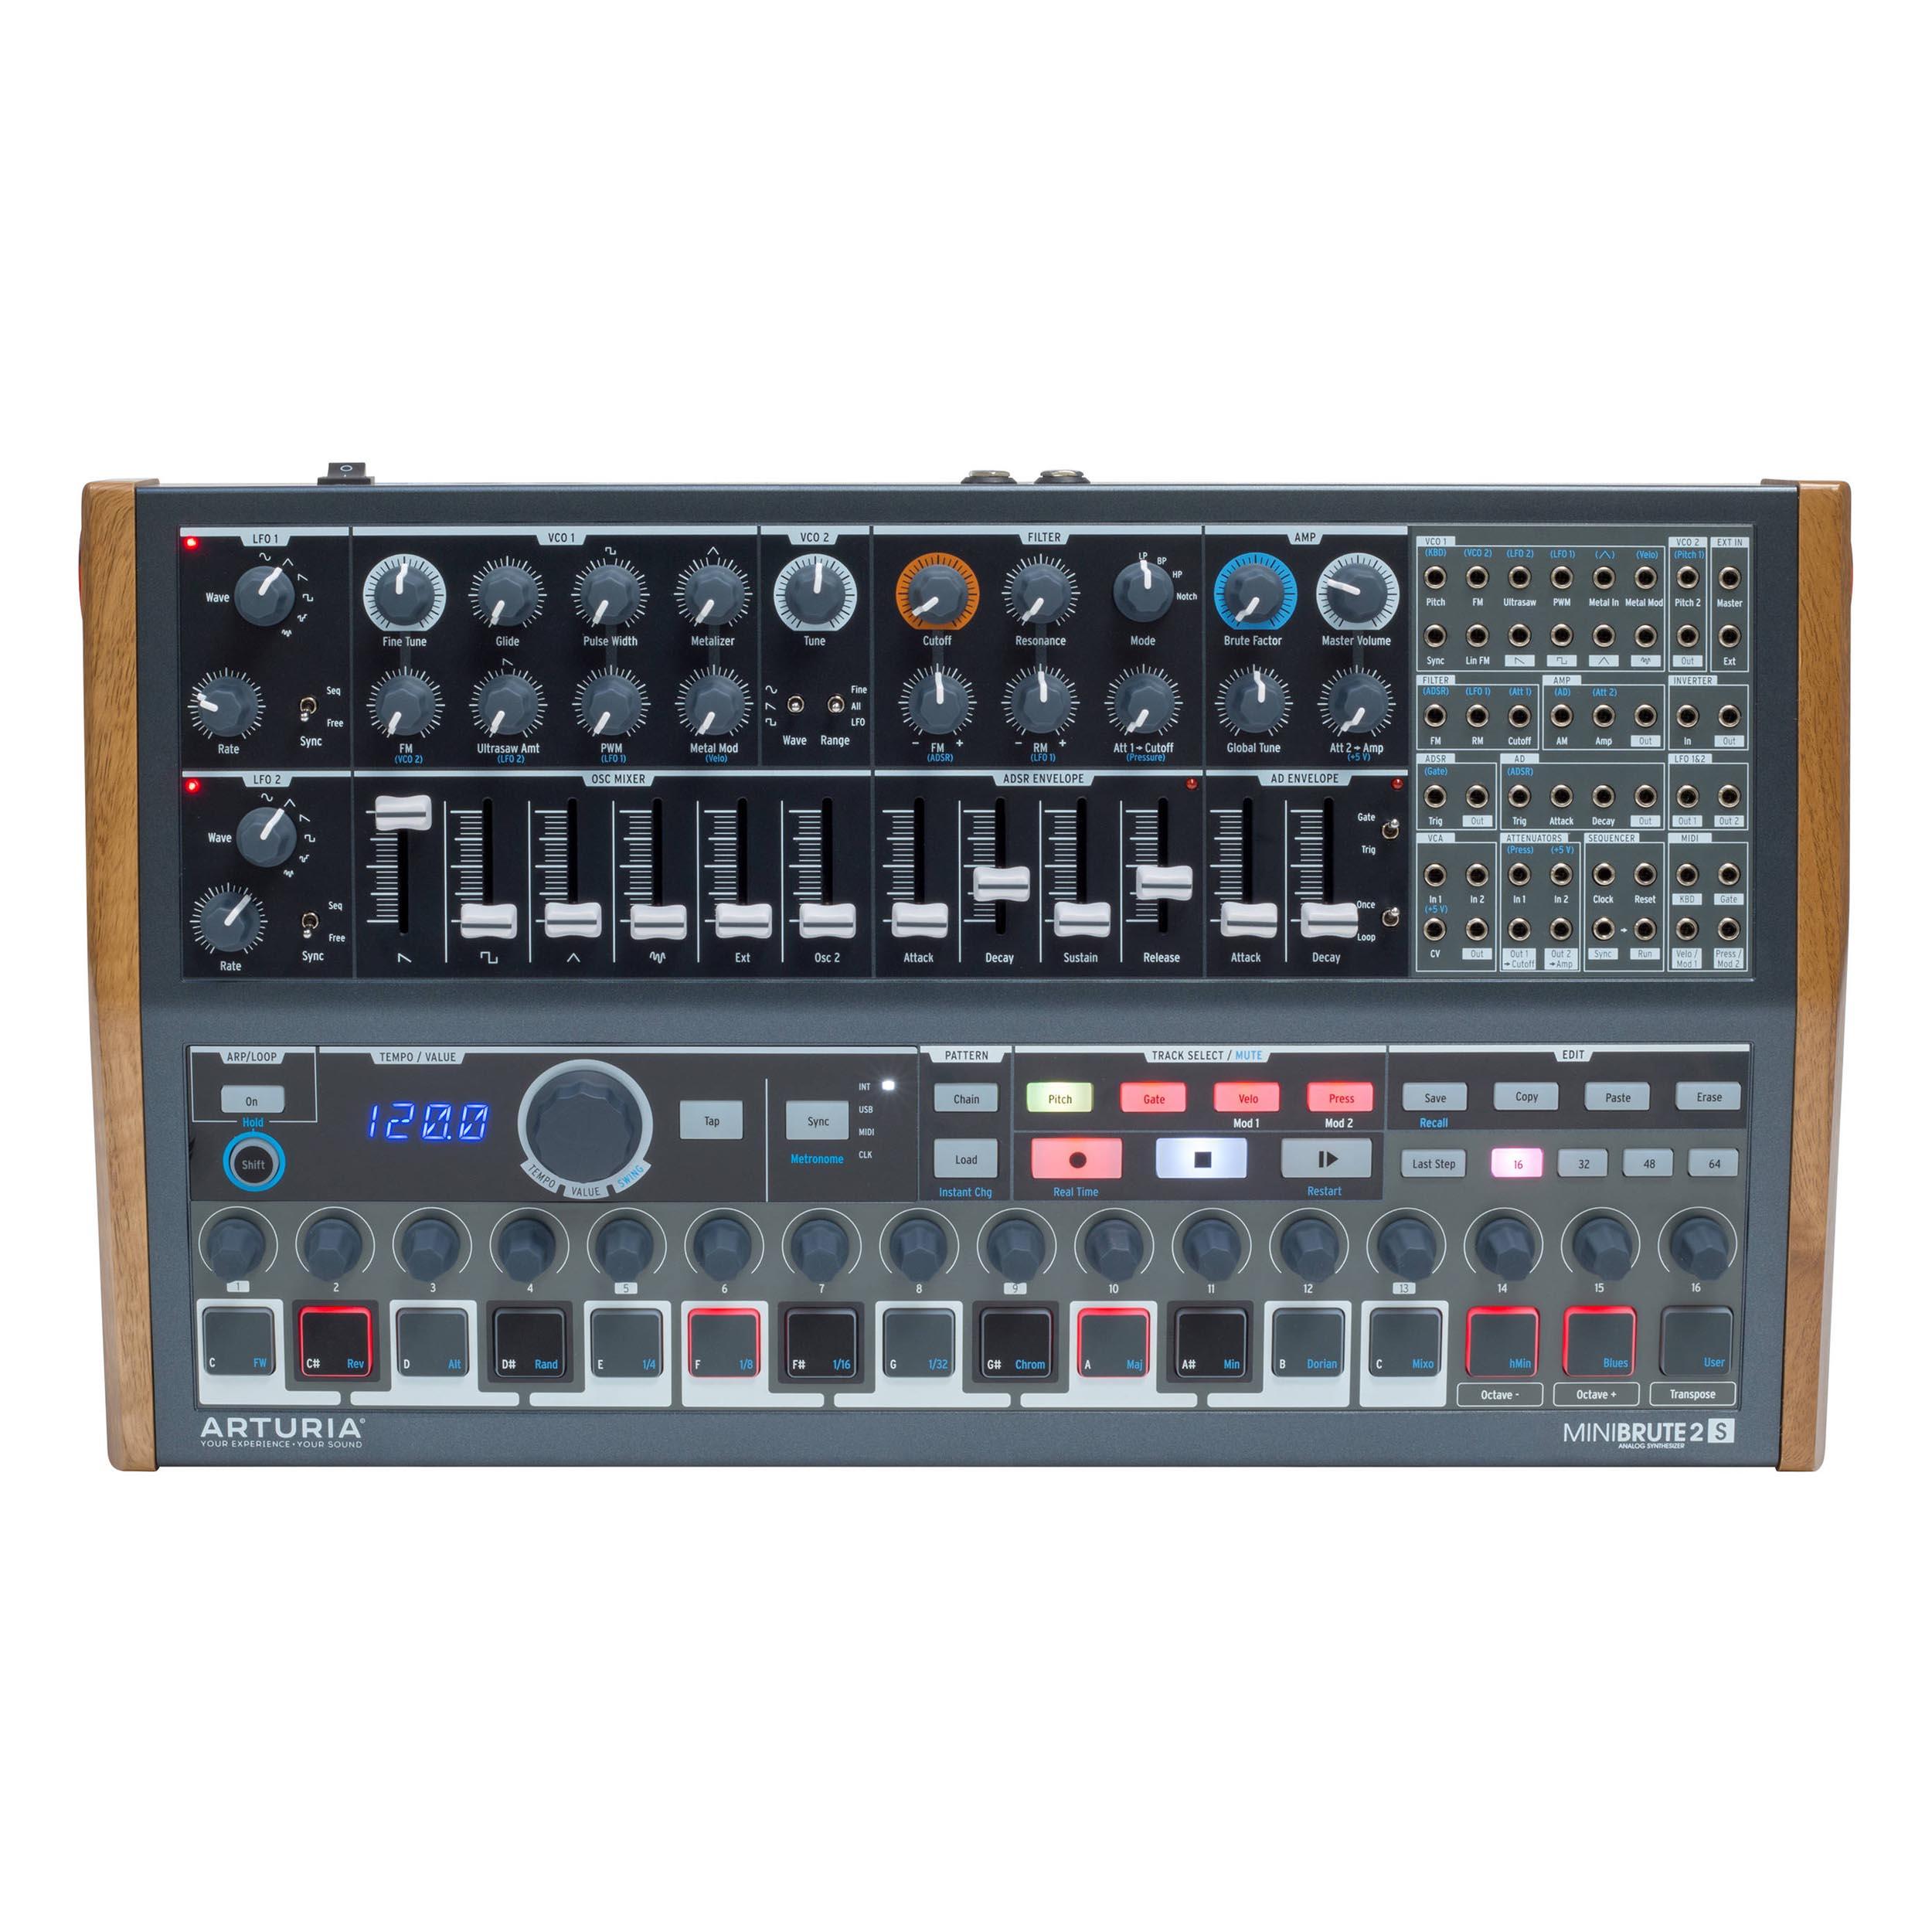 Arturia MiniBrute 2S Semi-Modular Analog Synthesizer/Sequencer